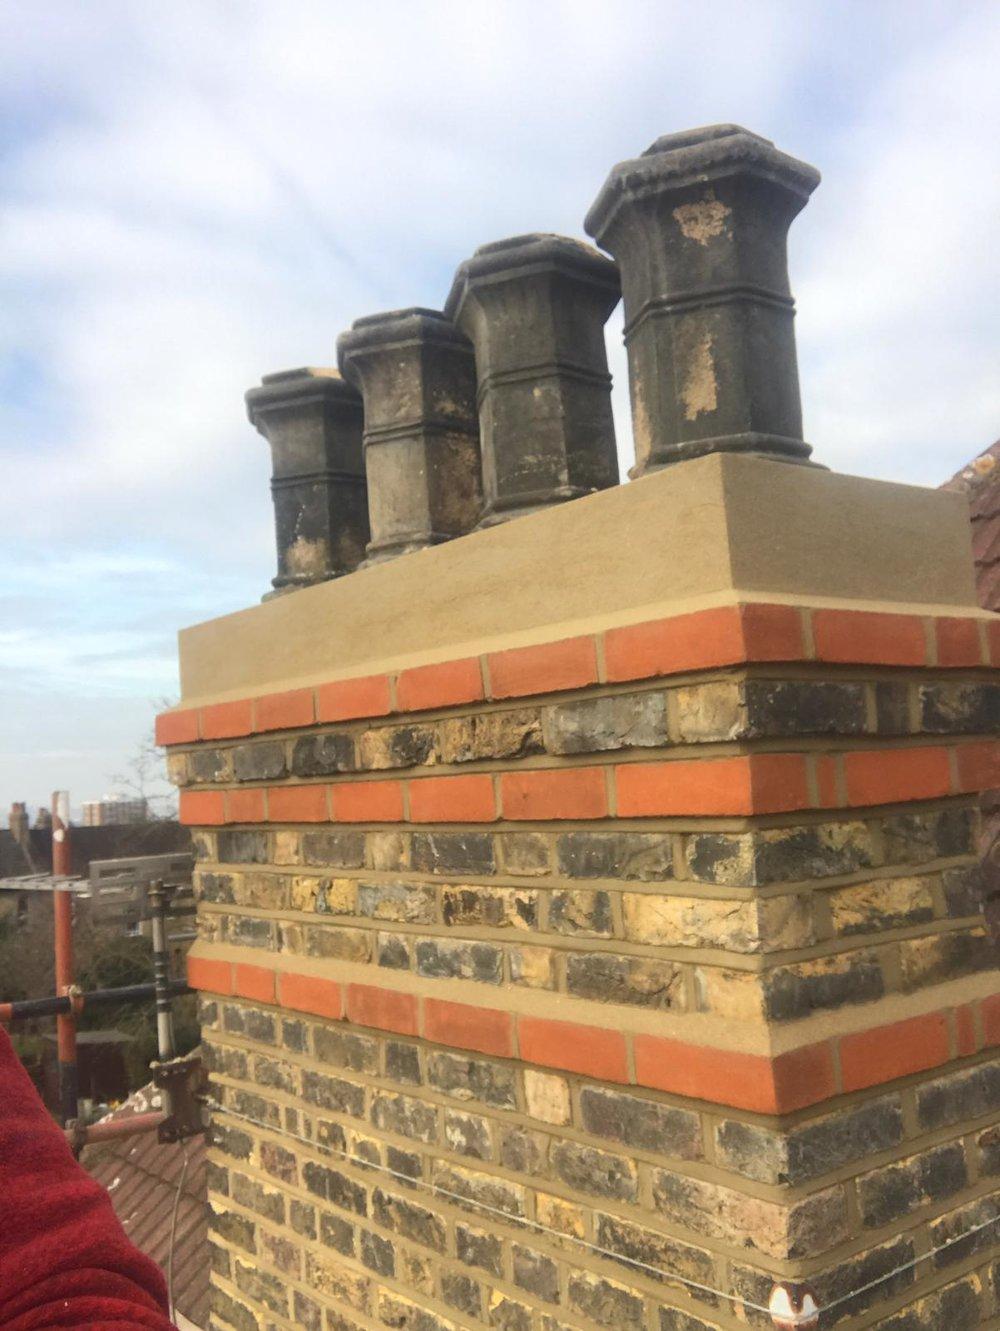 Brick Restoration Project 5 - After